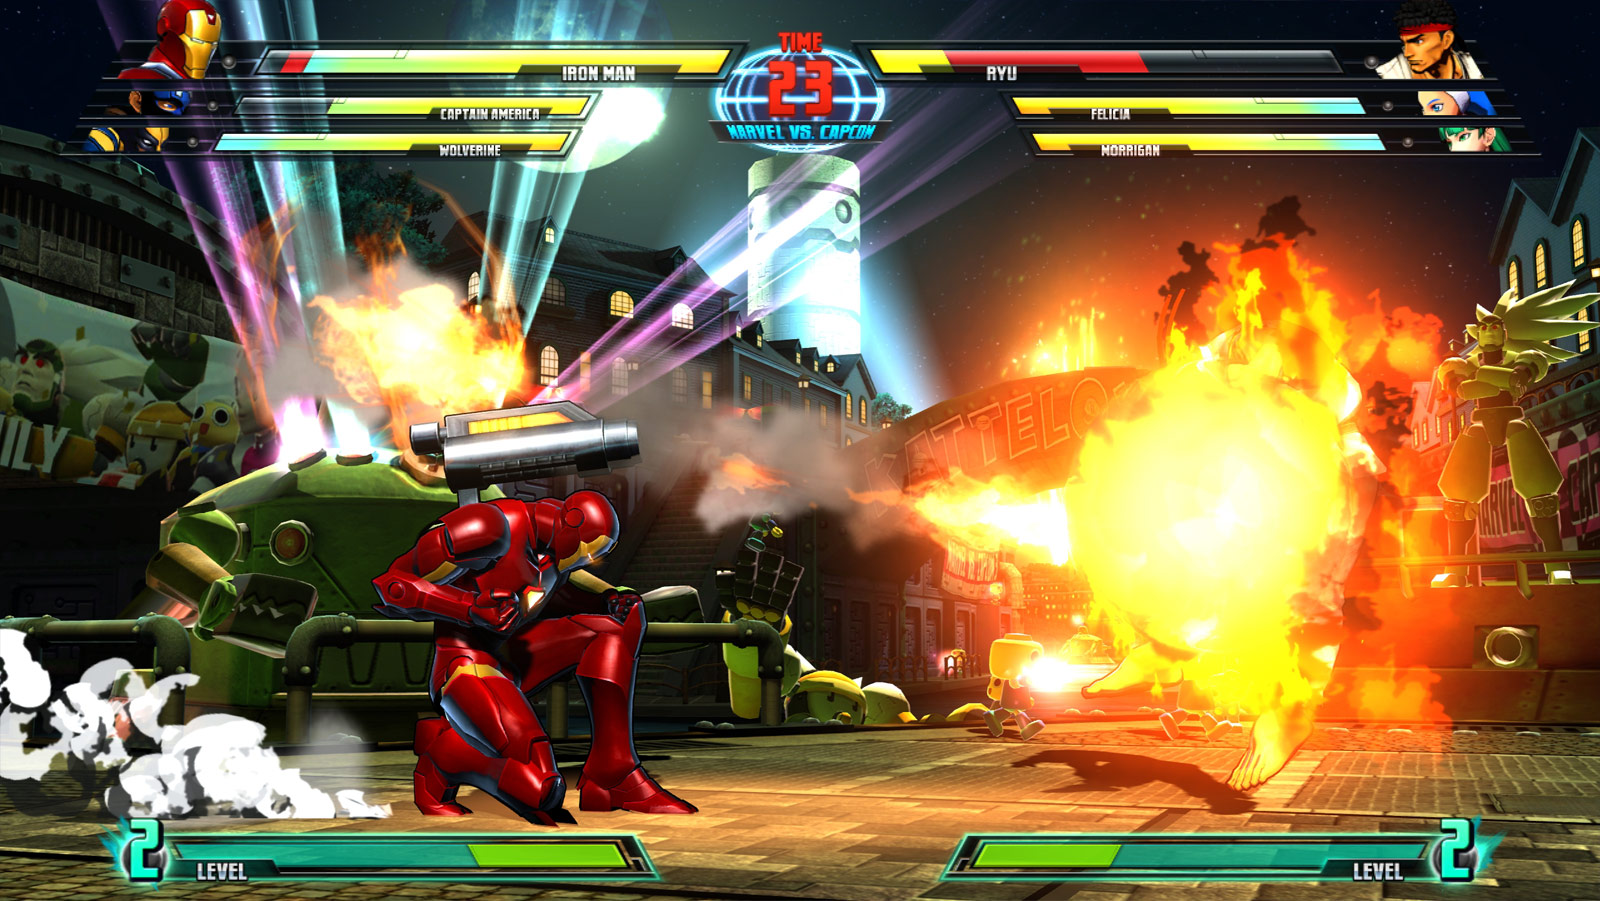 Marvel vs. Capcom 3 screen shot from E3 image #5